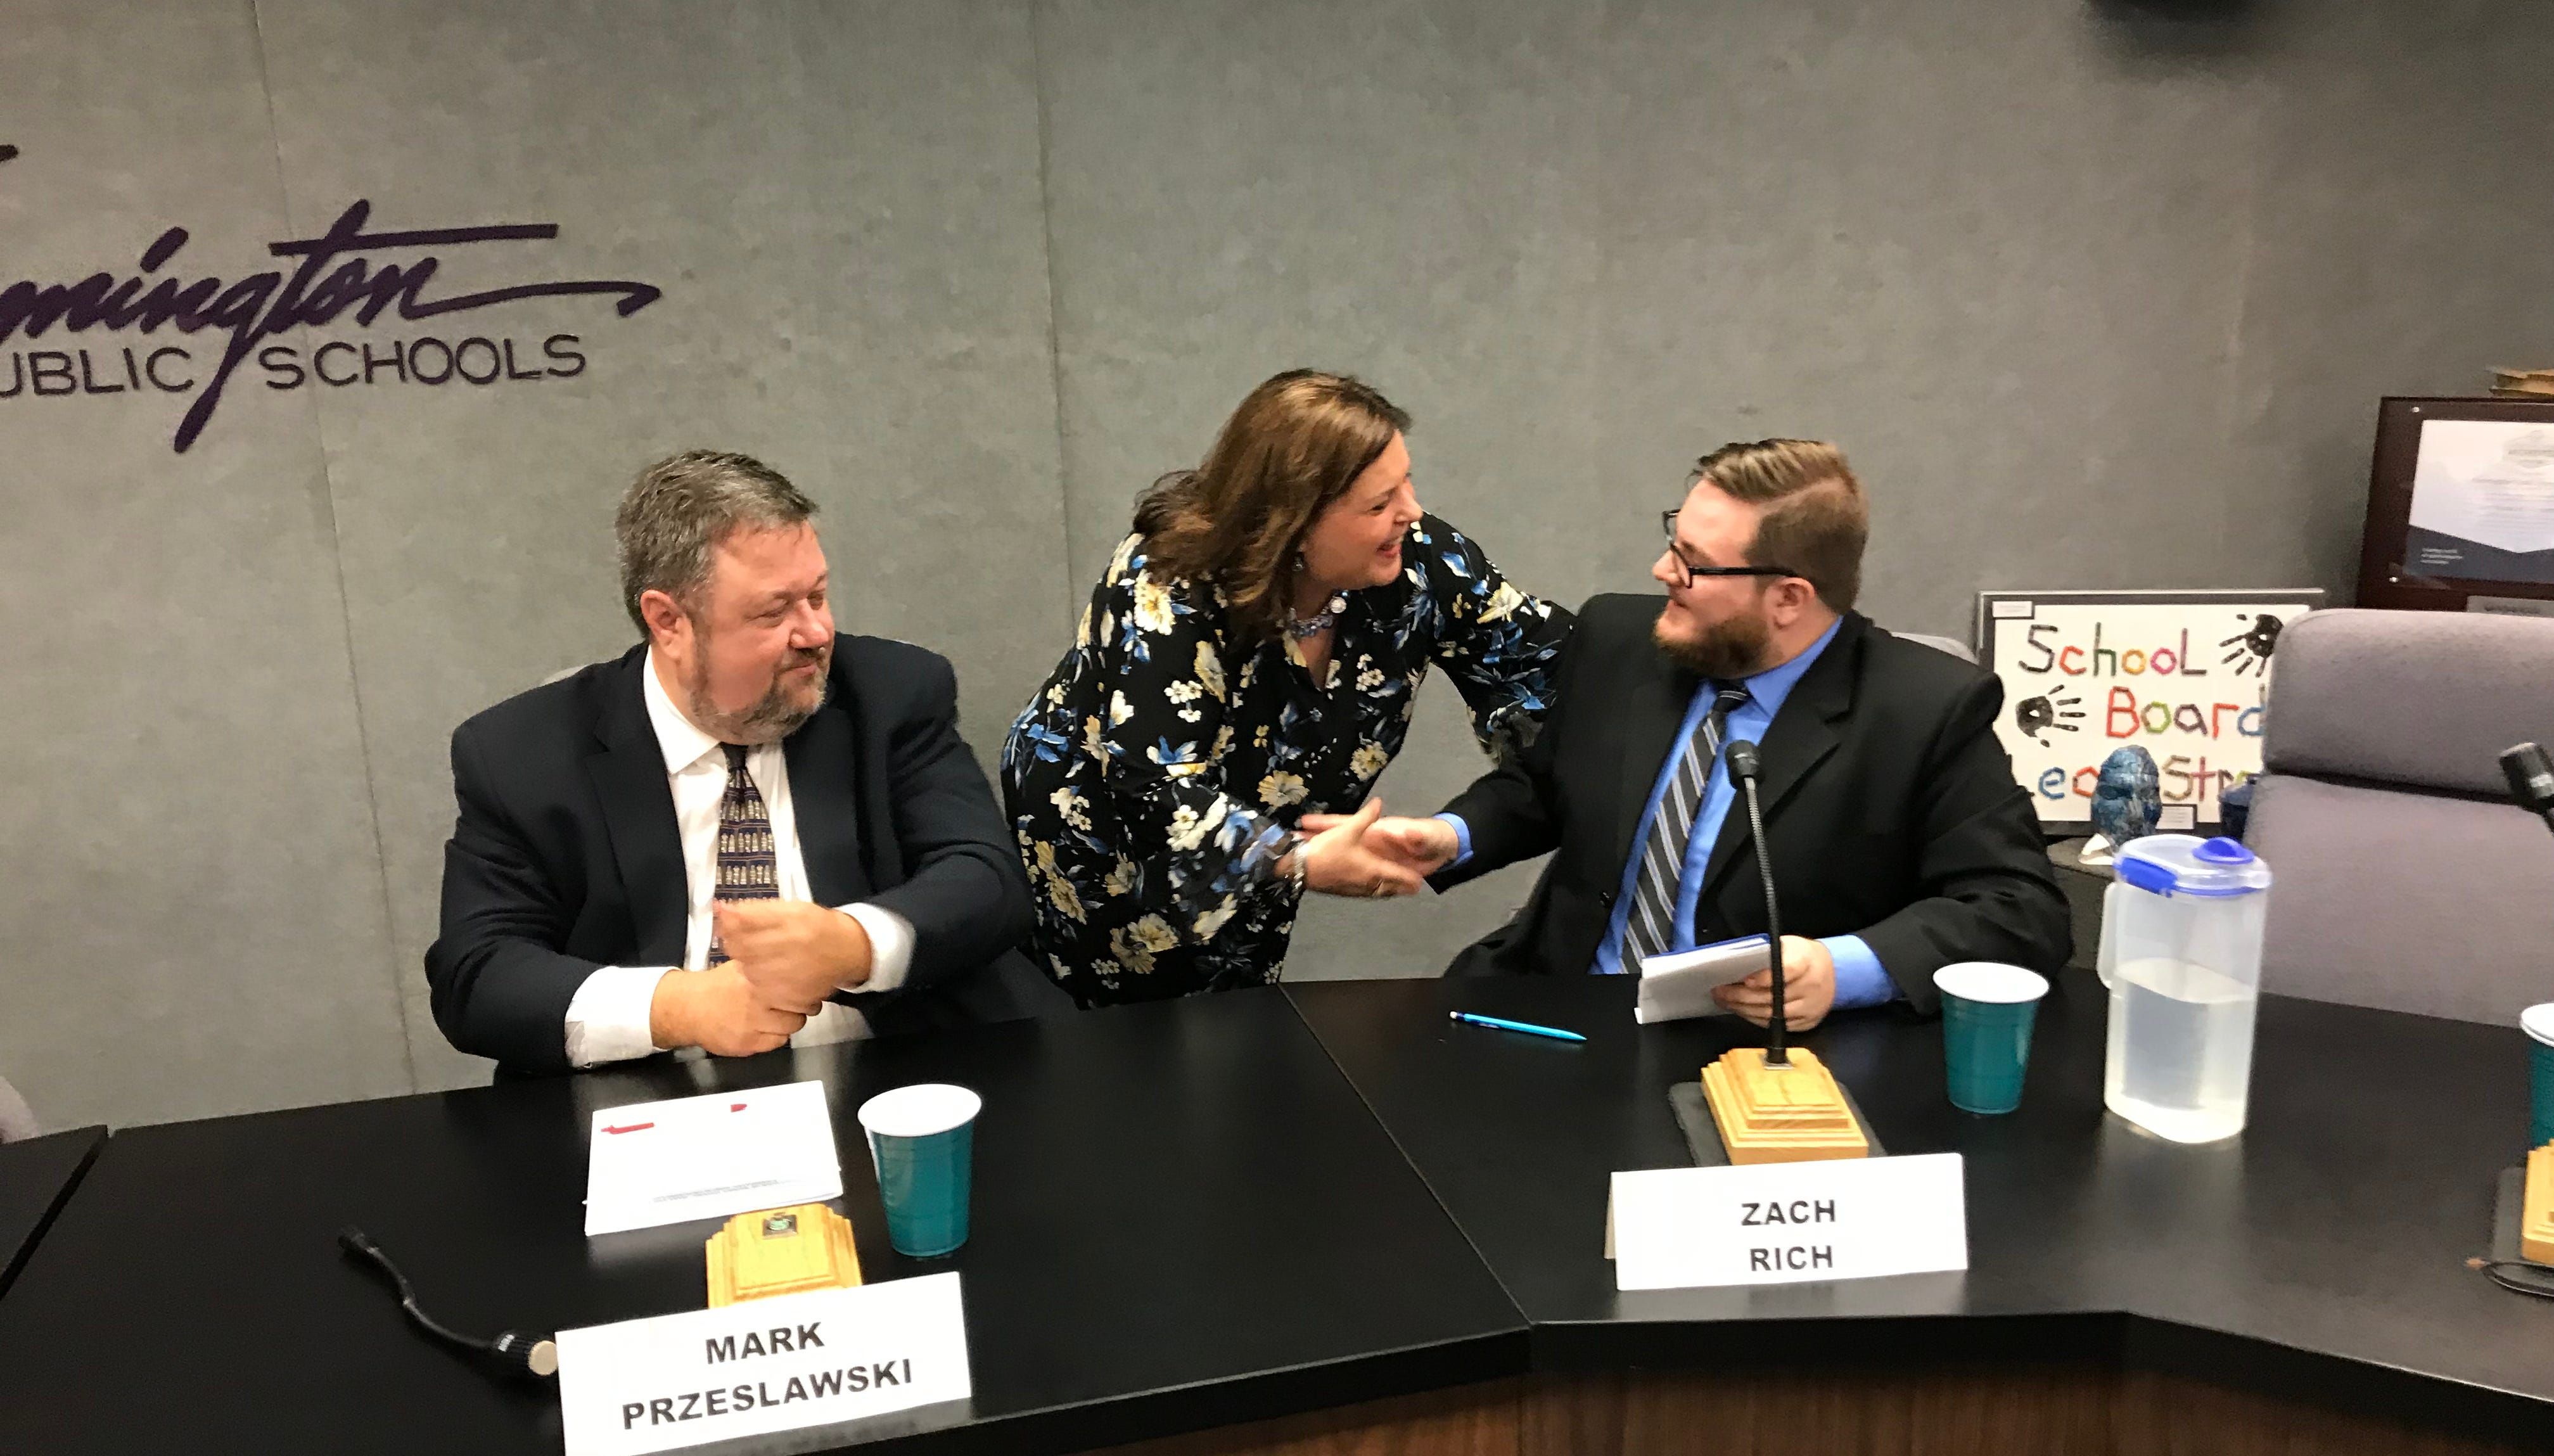 Pamela Green shakes hands with fellow school board candidates Zach Rich (right) and Mark Przeslawski following Tuesday's Farmington school board candidate forum.